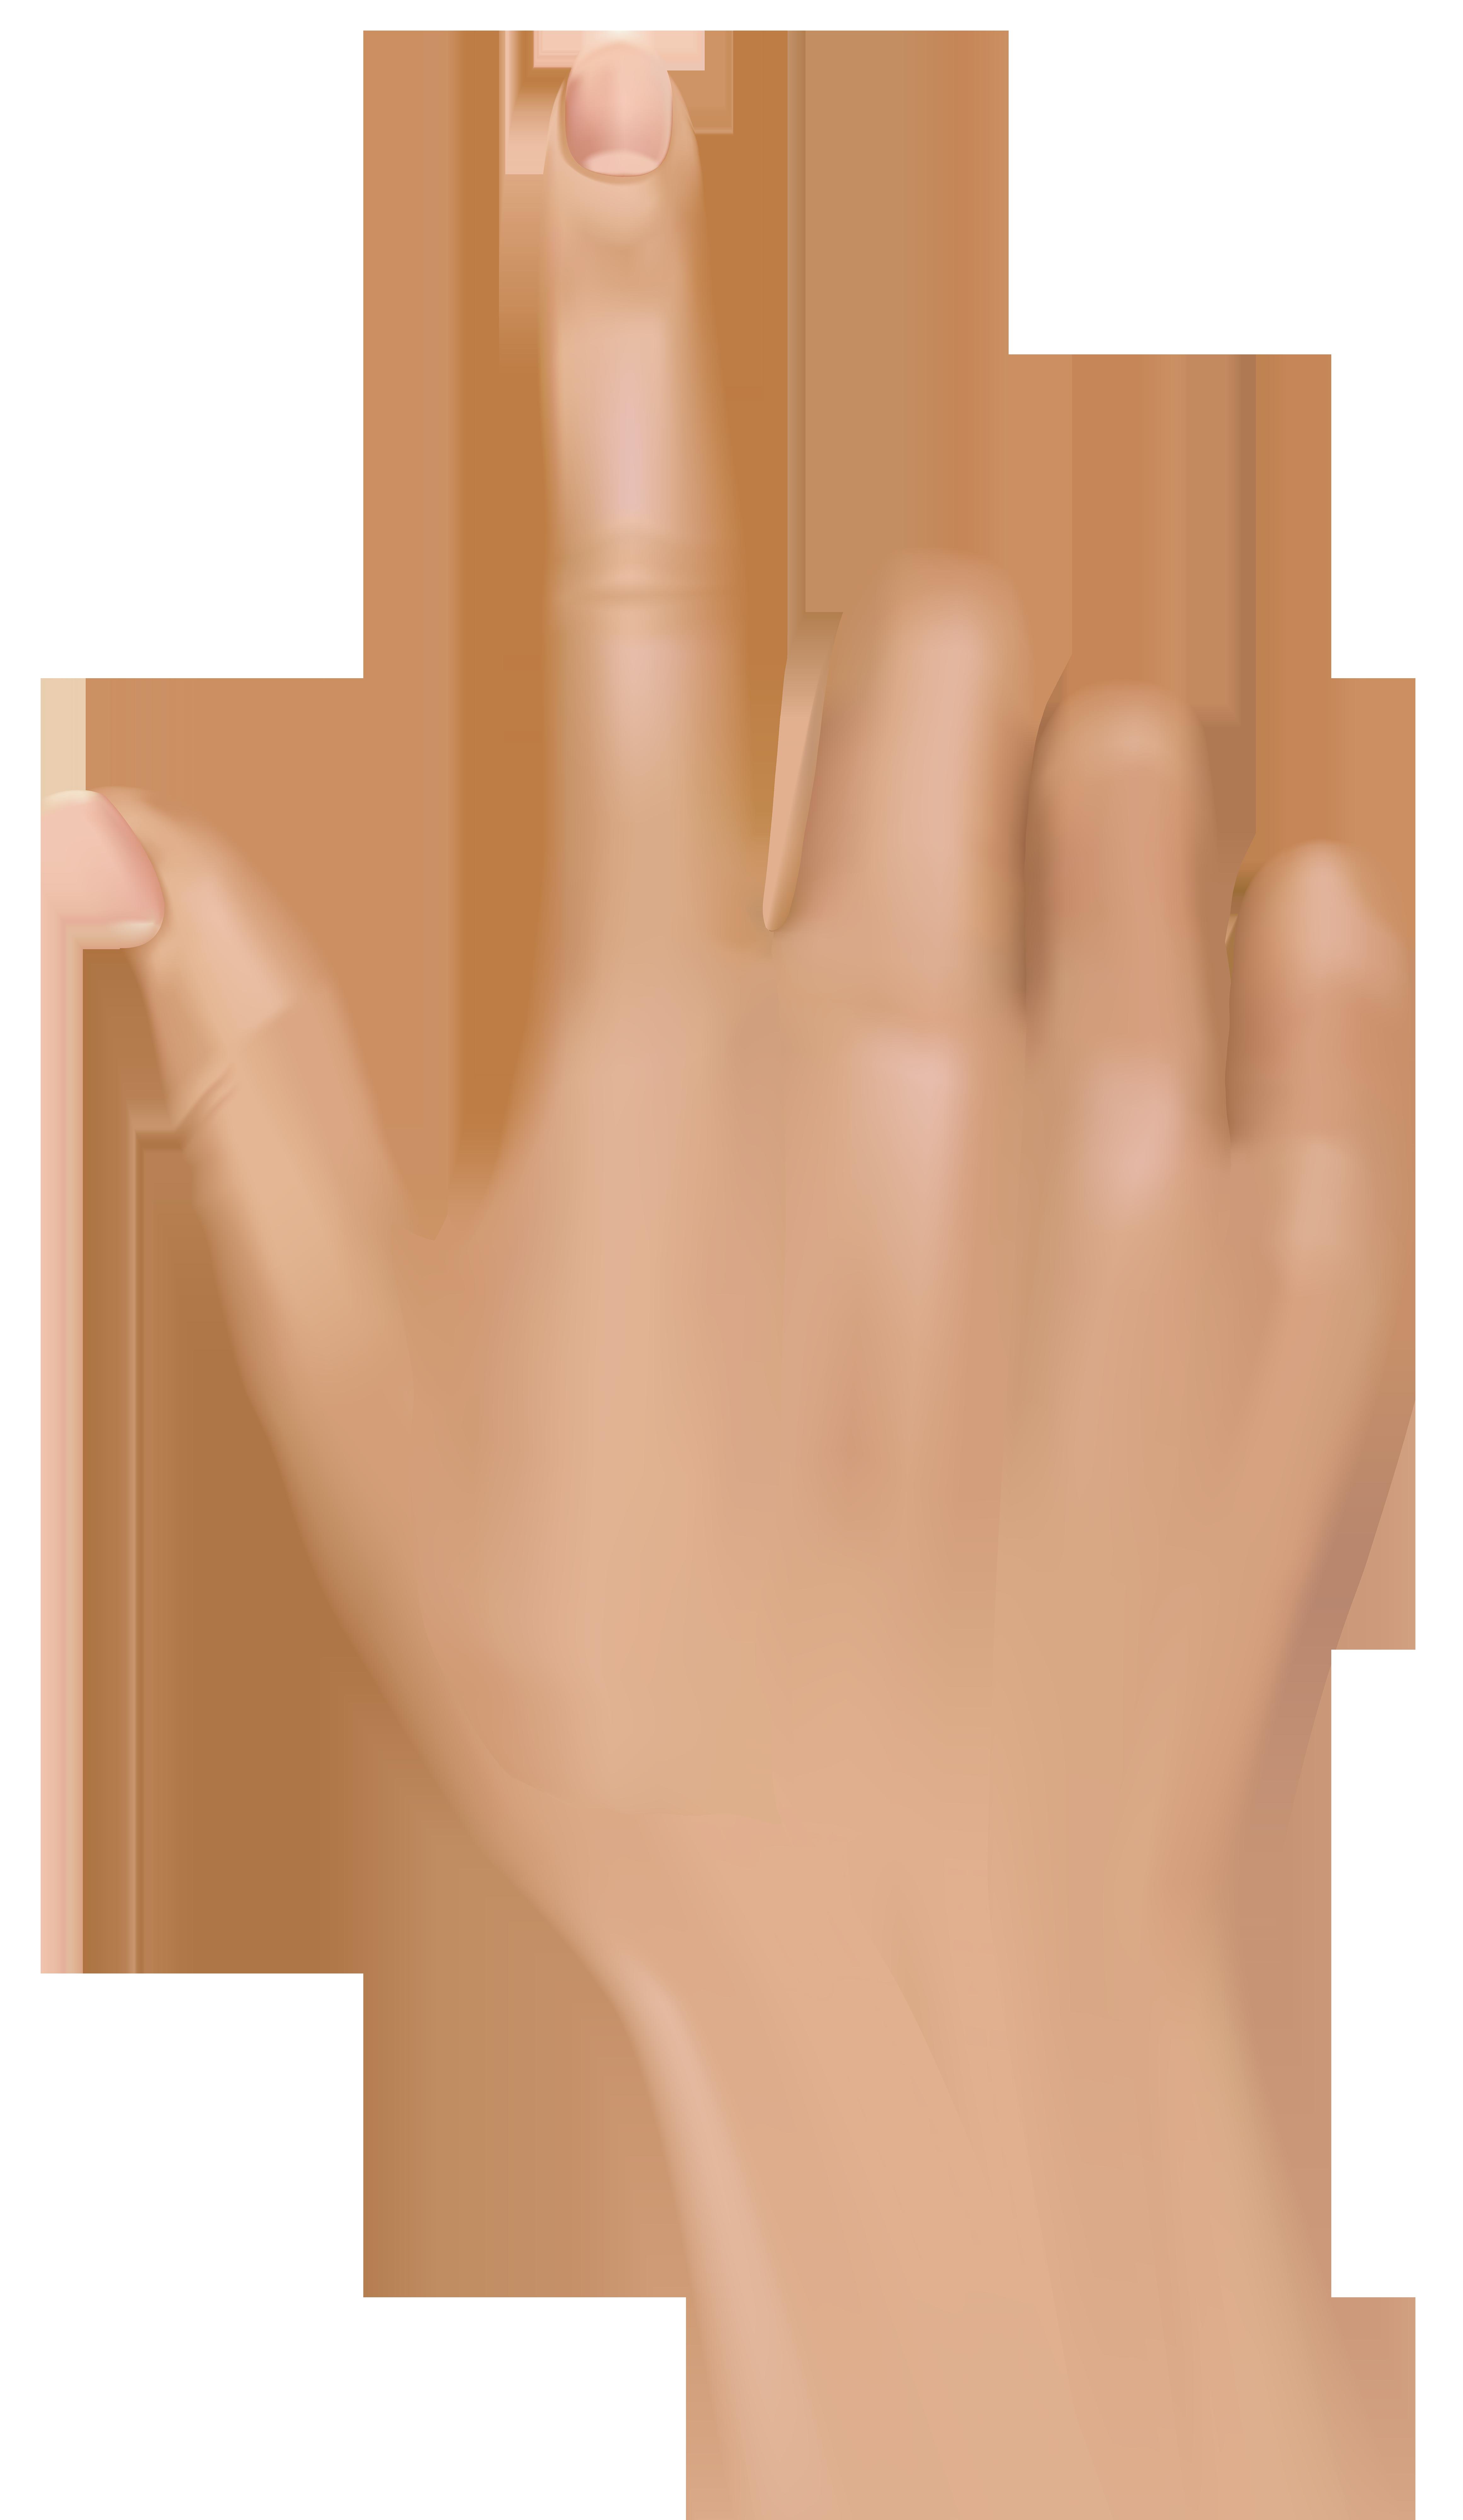 4643x8000 Tuching Finger Hand Png Clip Art